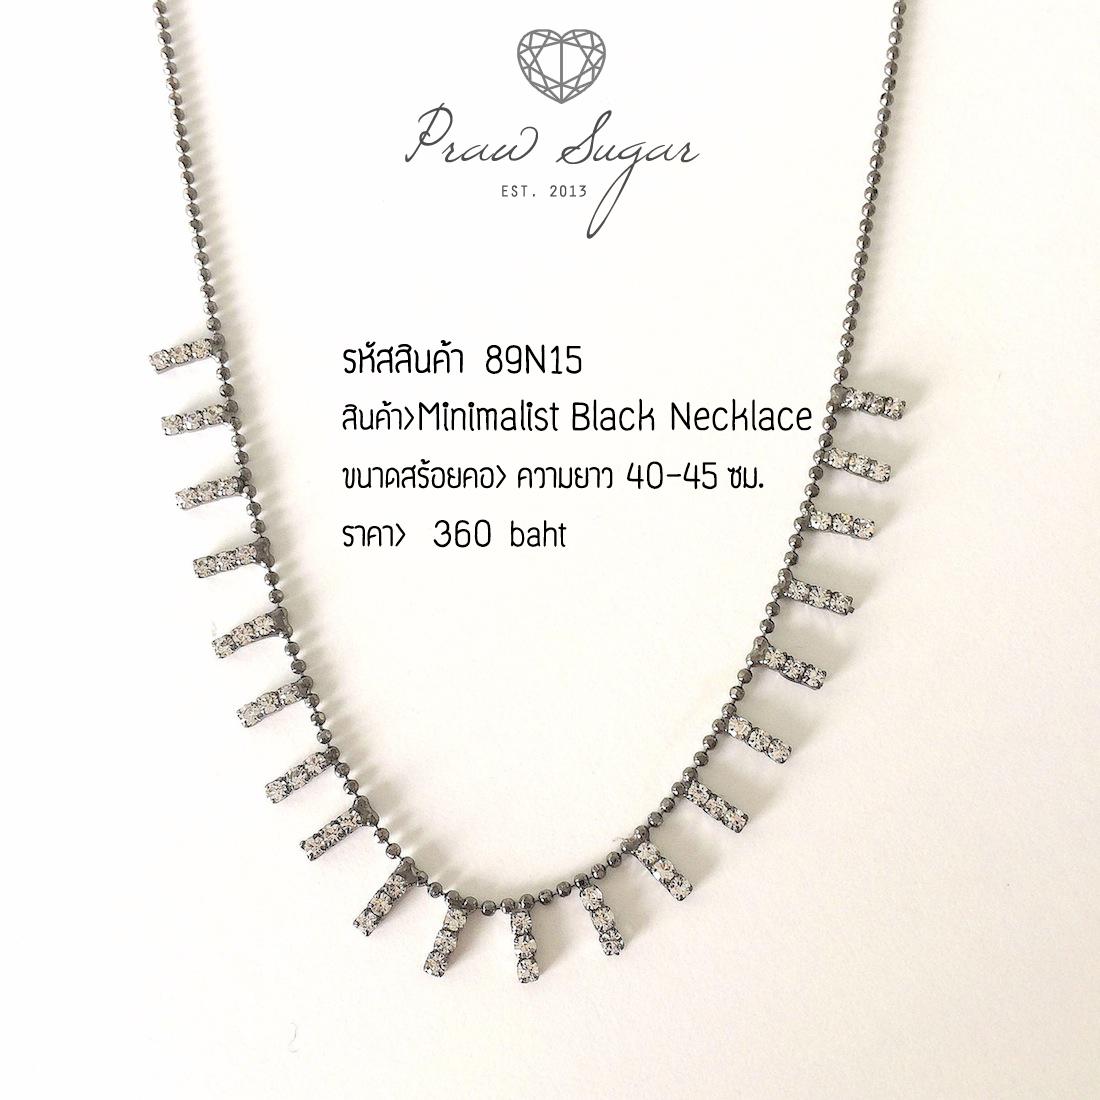 Minimalist Black Necklace